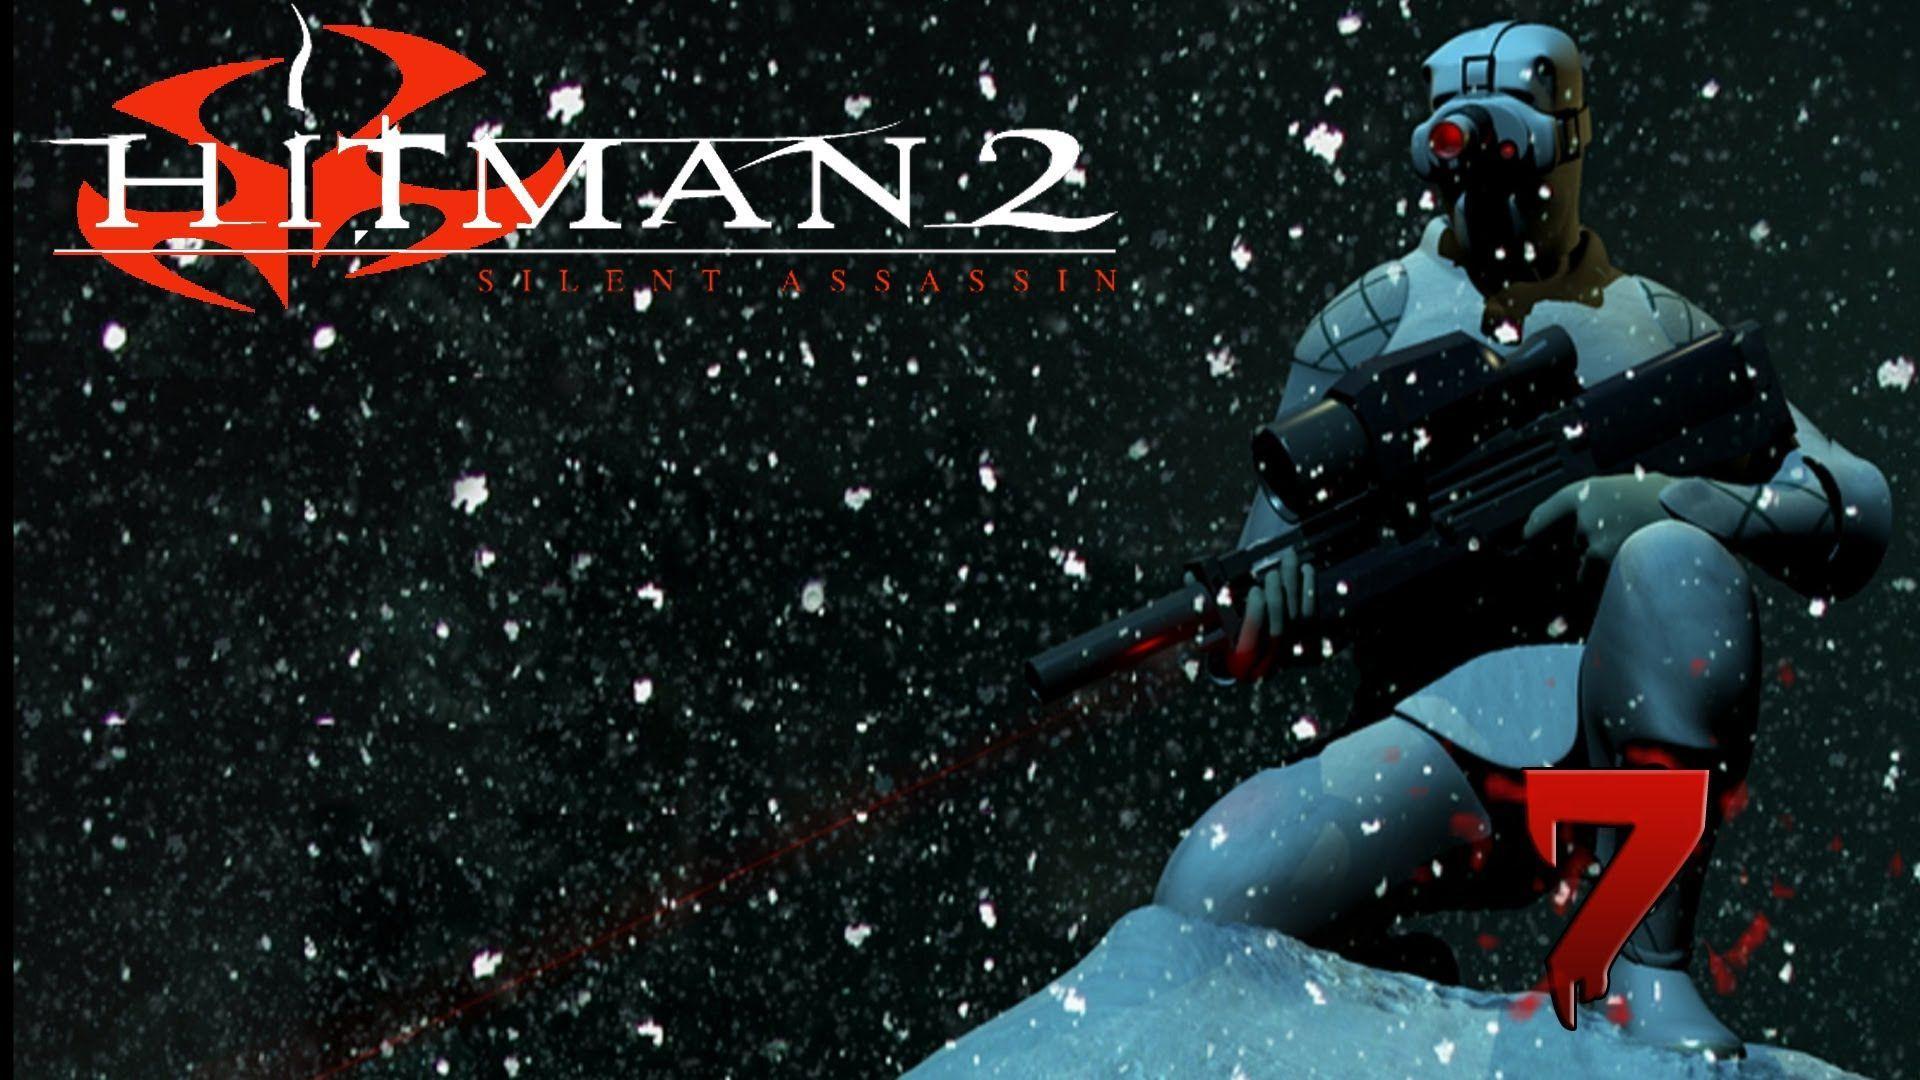 Hitman 2 Wallpapers - Top Free Hitman 2 Backgrounds